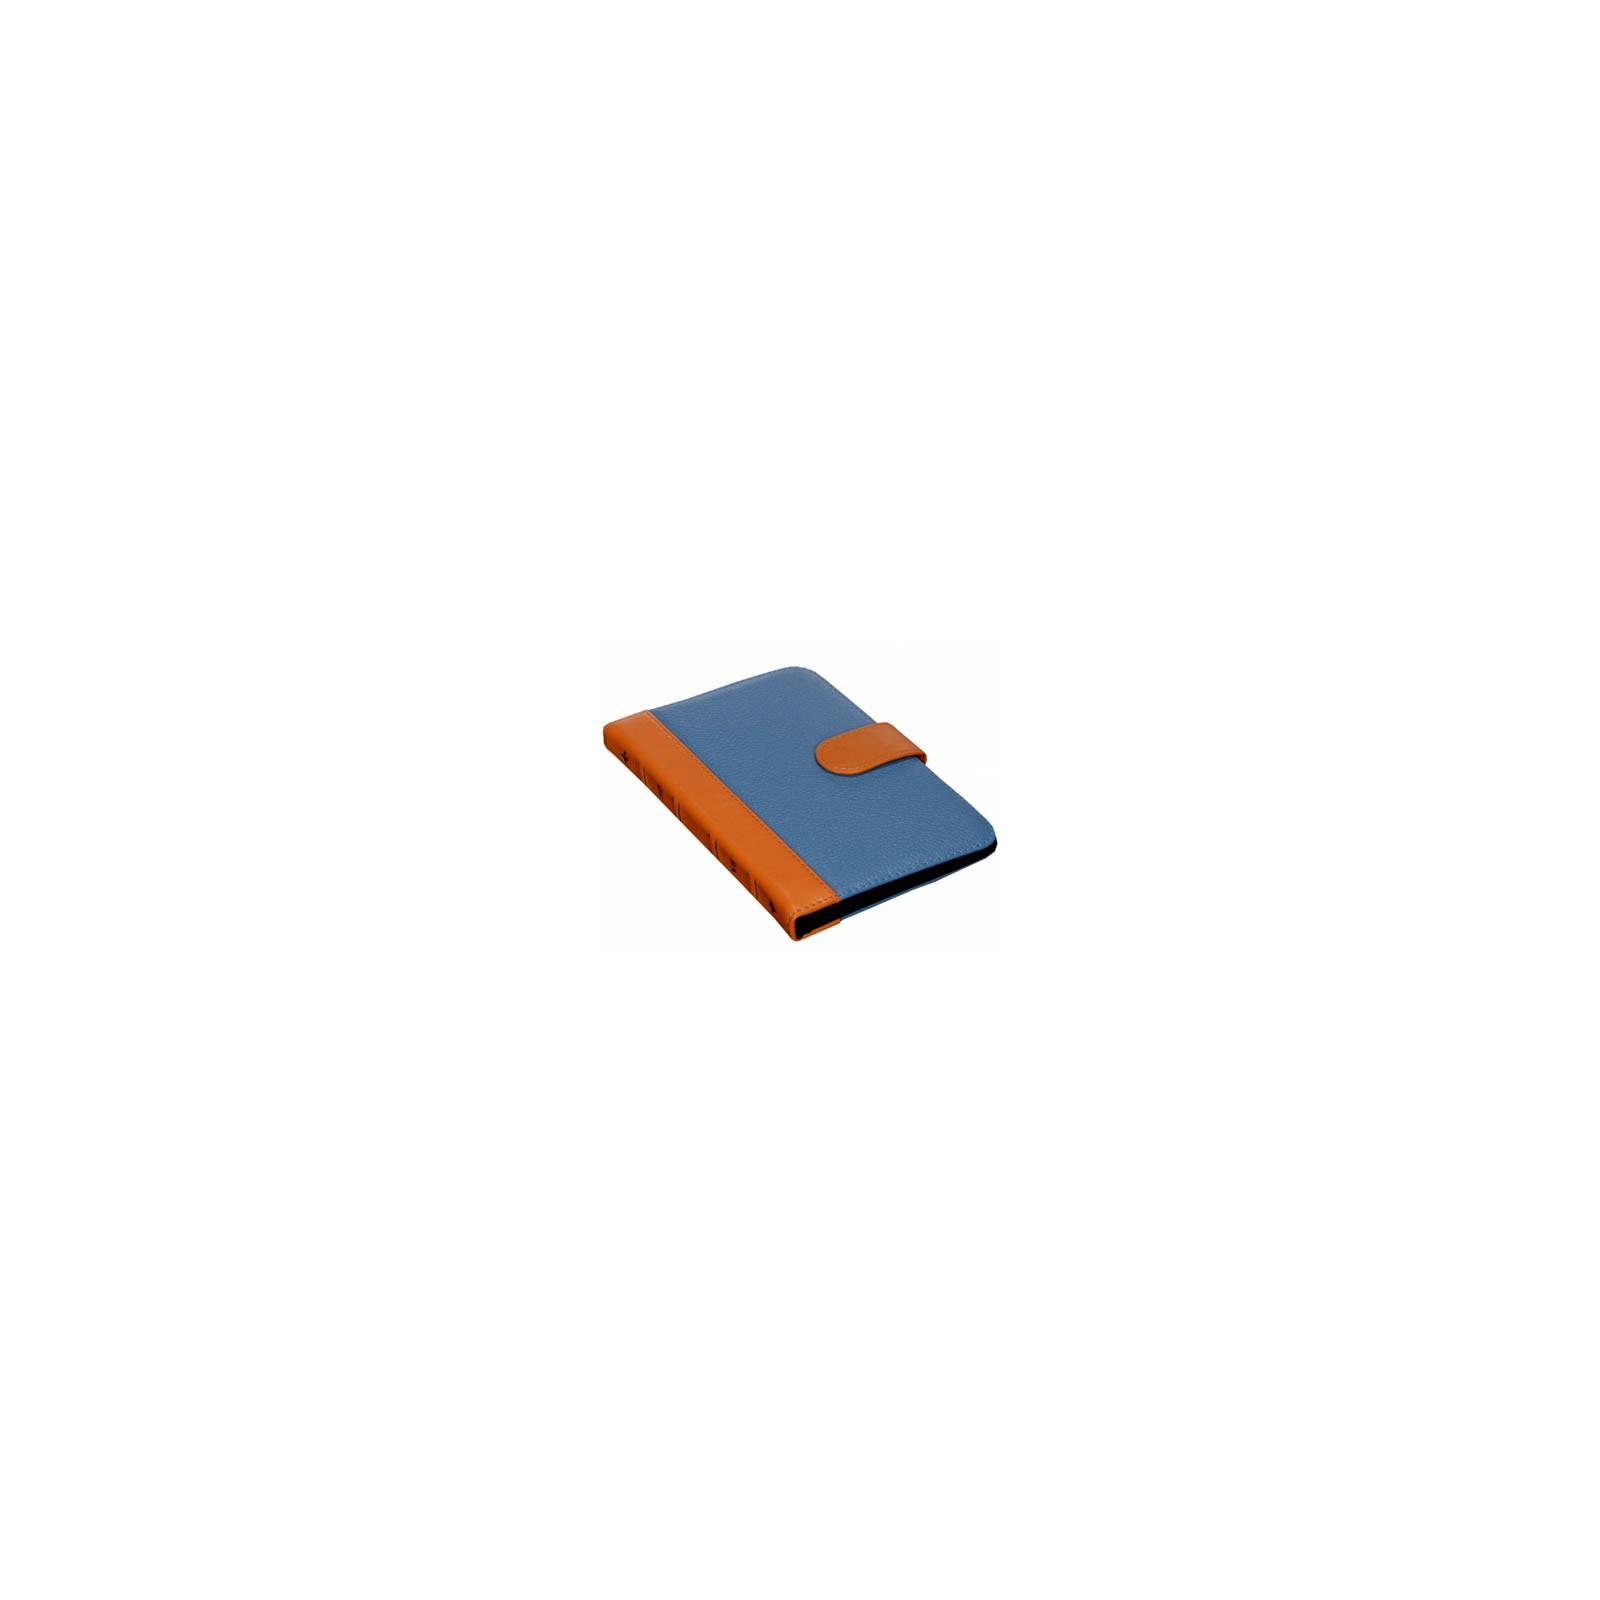 Чехол для электронной книги SB Bookcase S Blue-Orange (SB142086)